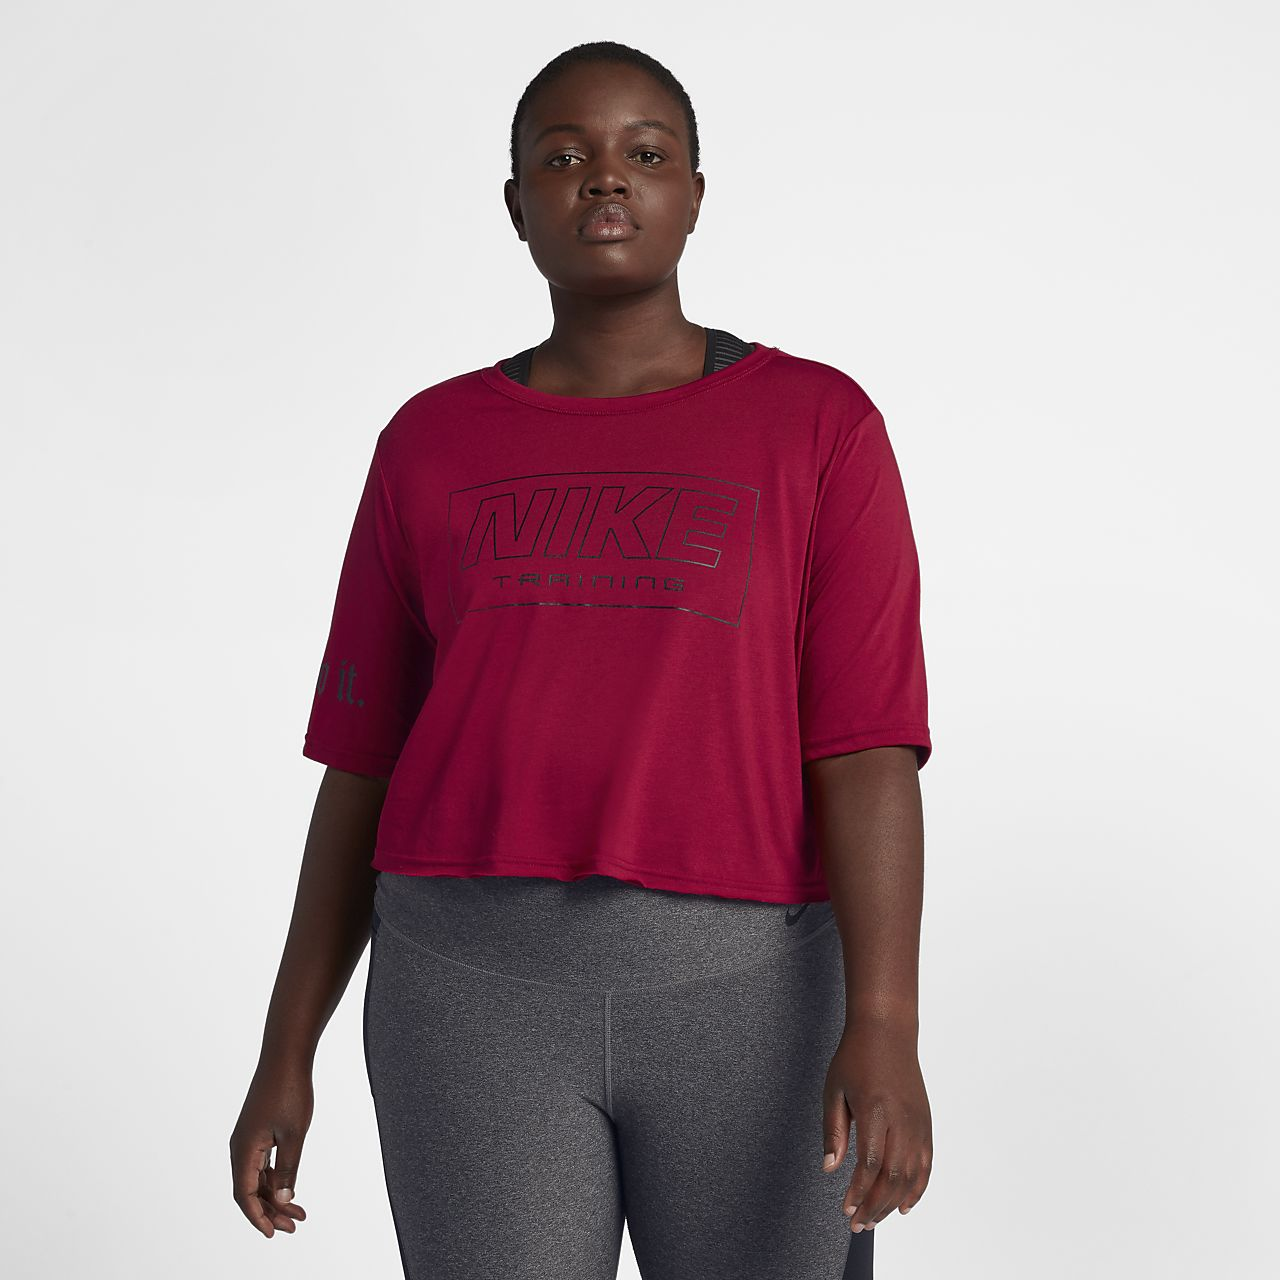 2adb2e0b3063 Γυναικεία κοντομάνικη μπλούζα προπόνησης Nike (μεγάλα μεγέθη). Nike ...